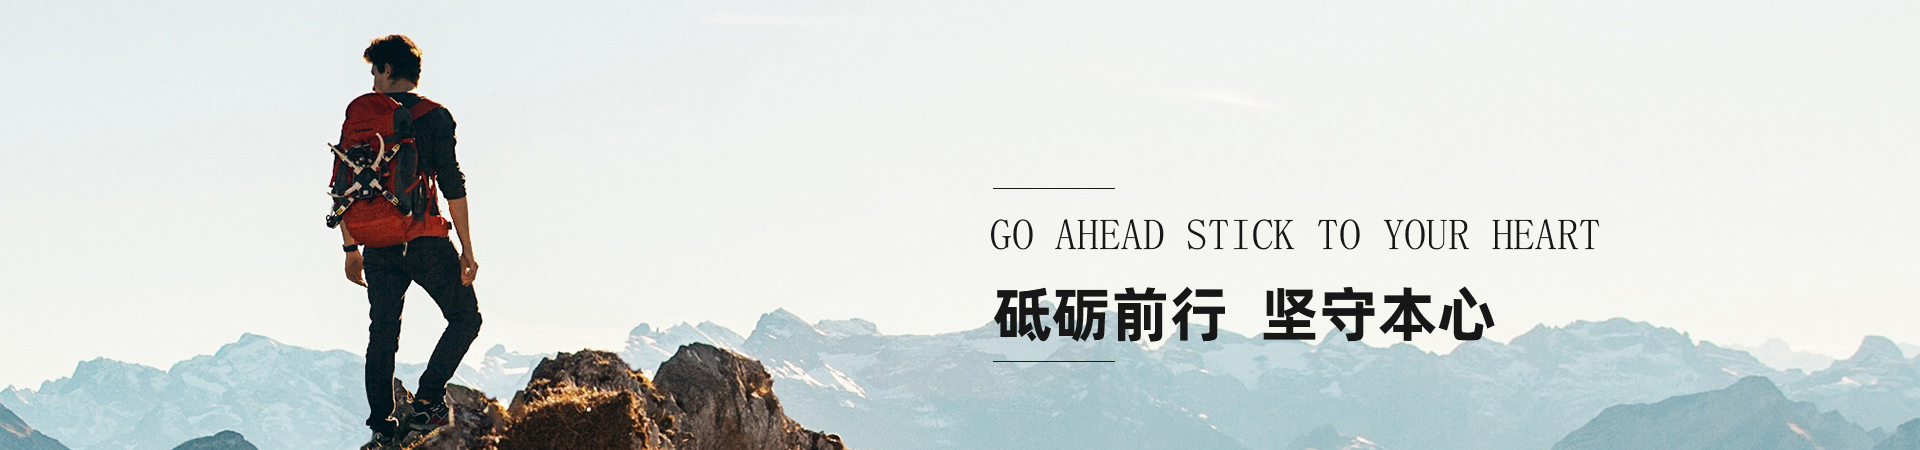 http://www.szzxwy.cn/data/upload/202007/20200725085721_708.jpg